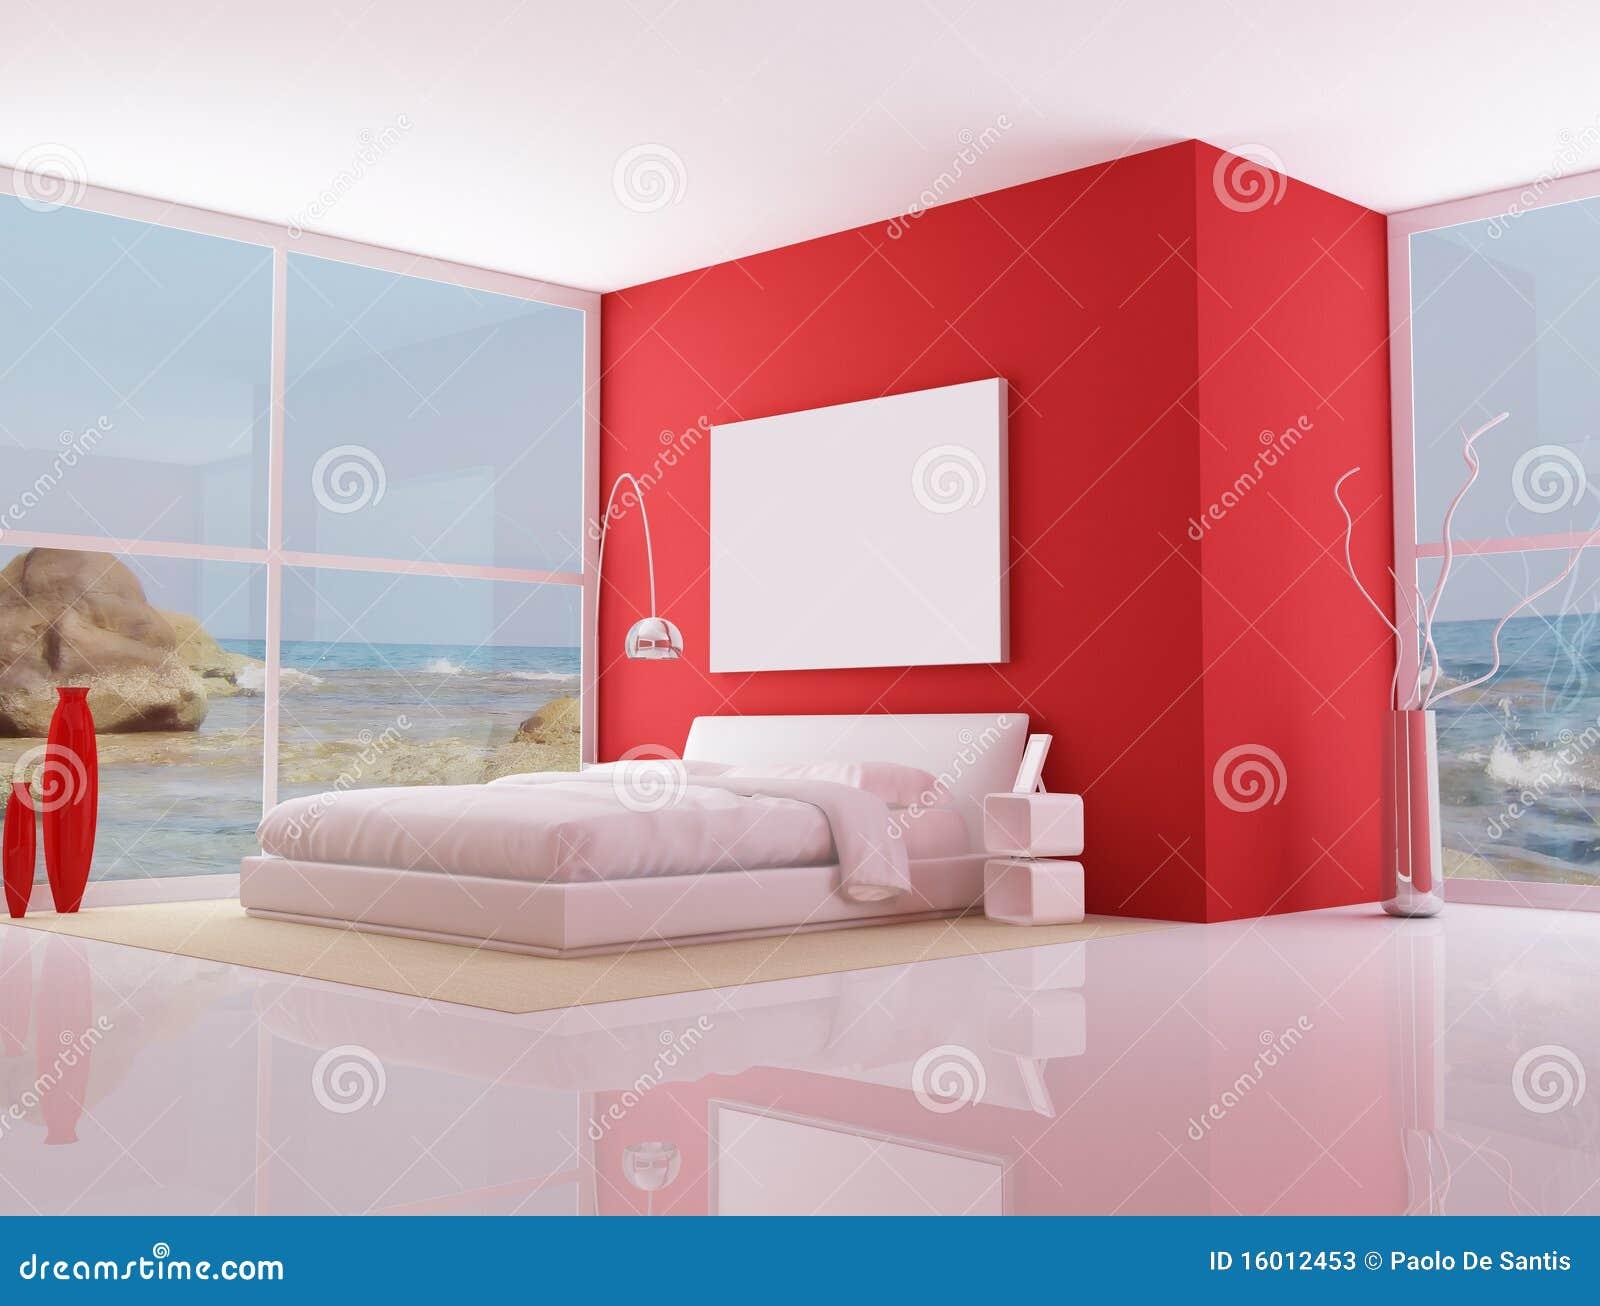 chambre coucher minimaliste rouge. Black Bedroom Furniture Sets. Home Design Ideas